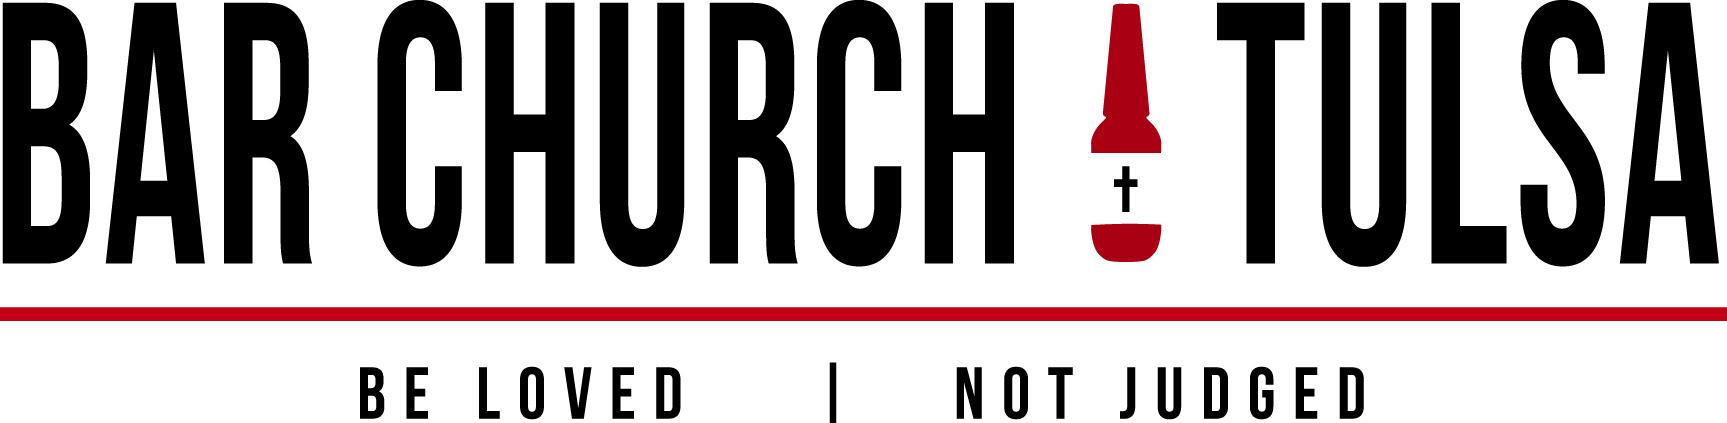 Bar Church Tulsa - Be loved - Not Judged